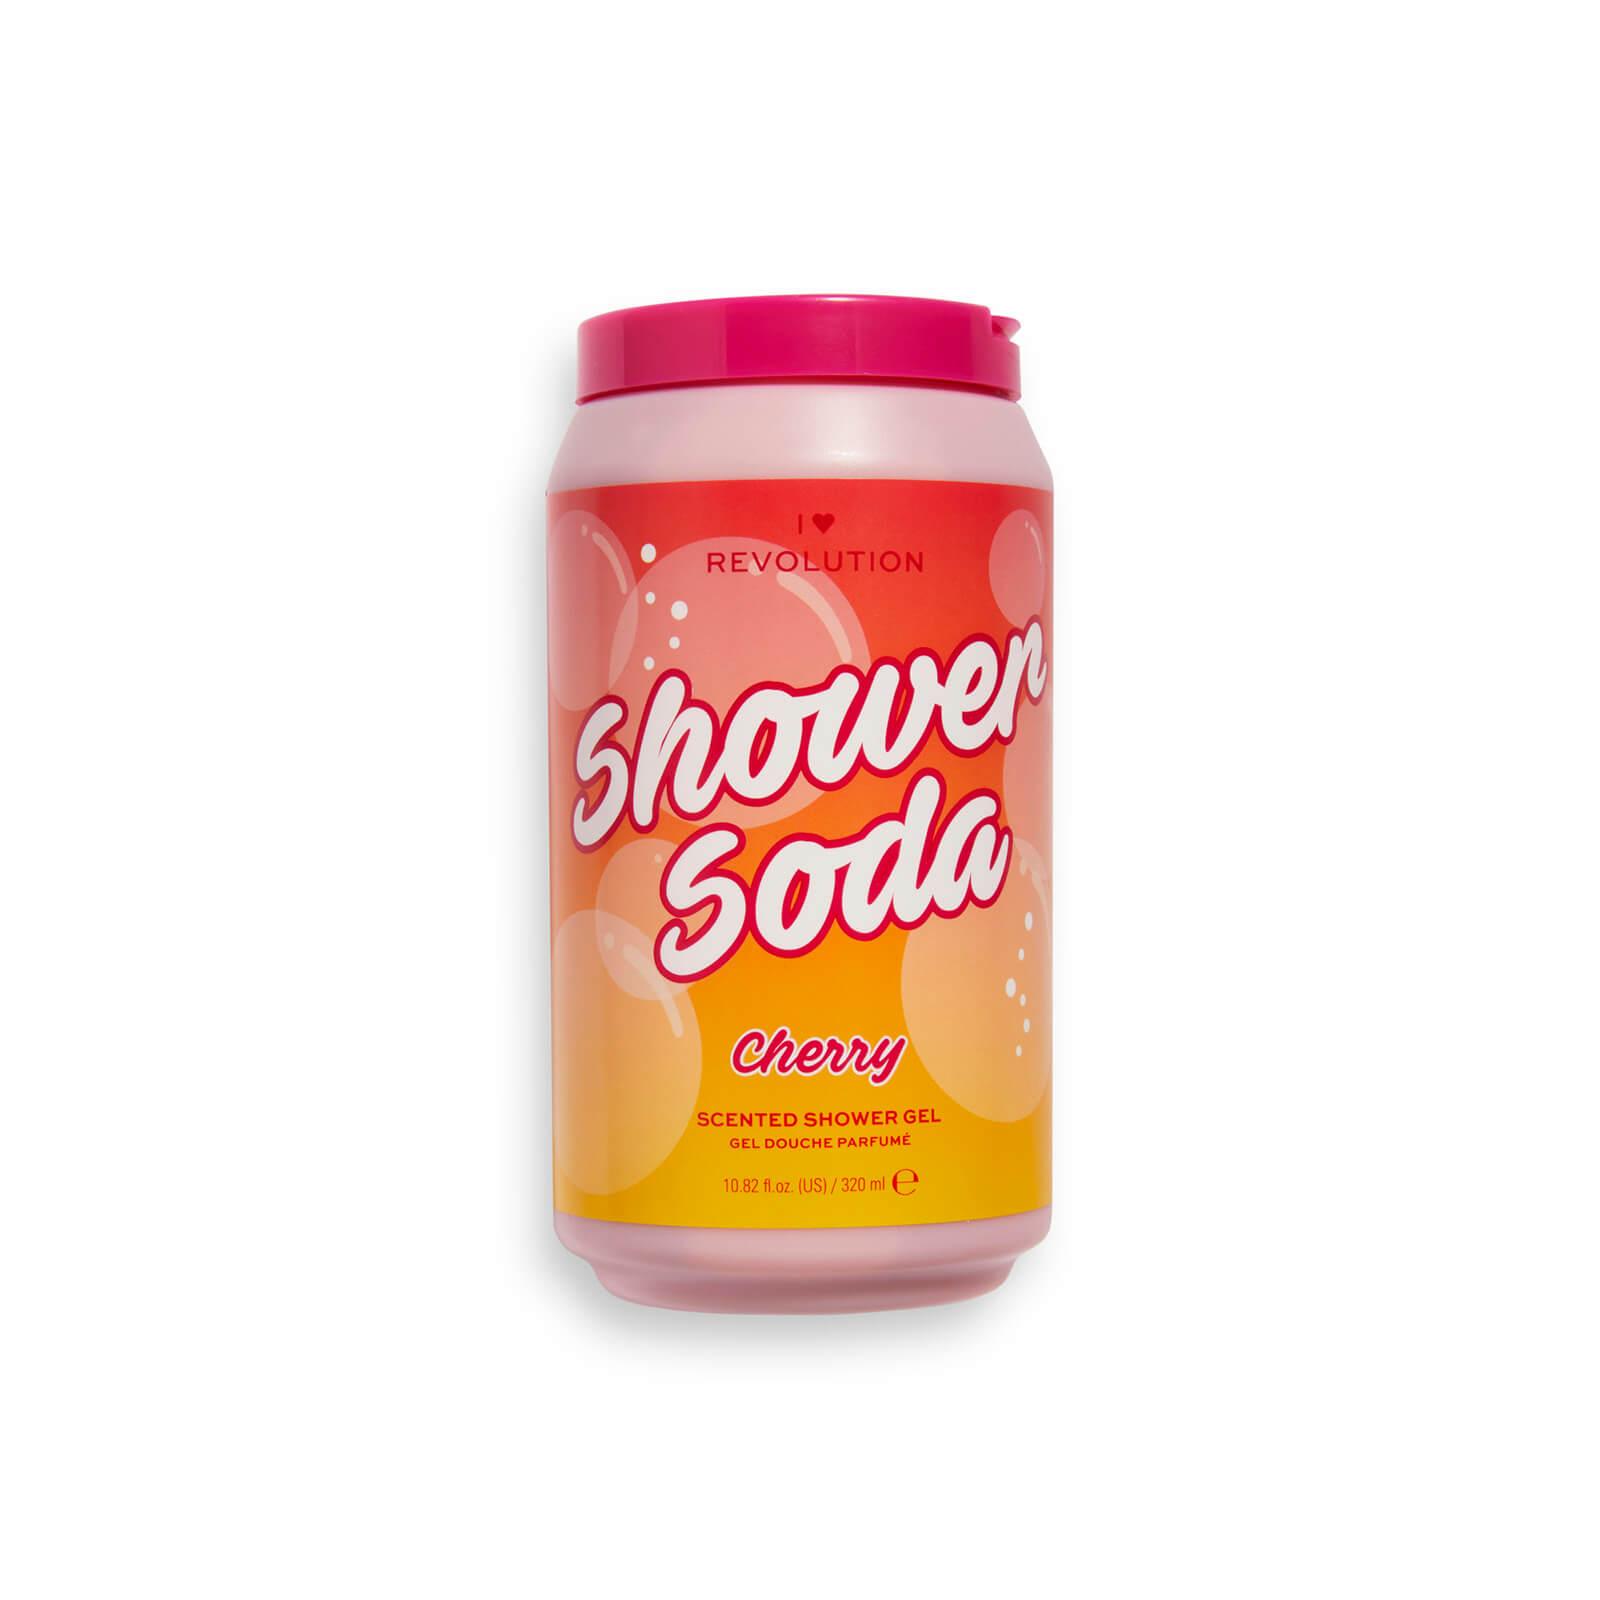 Купить I Heart Revolution Tasty Shower Soda Cherry